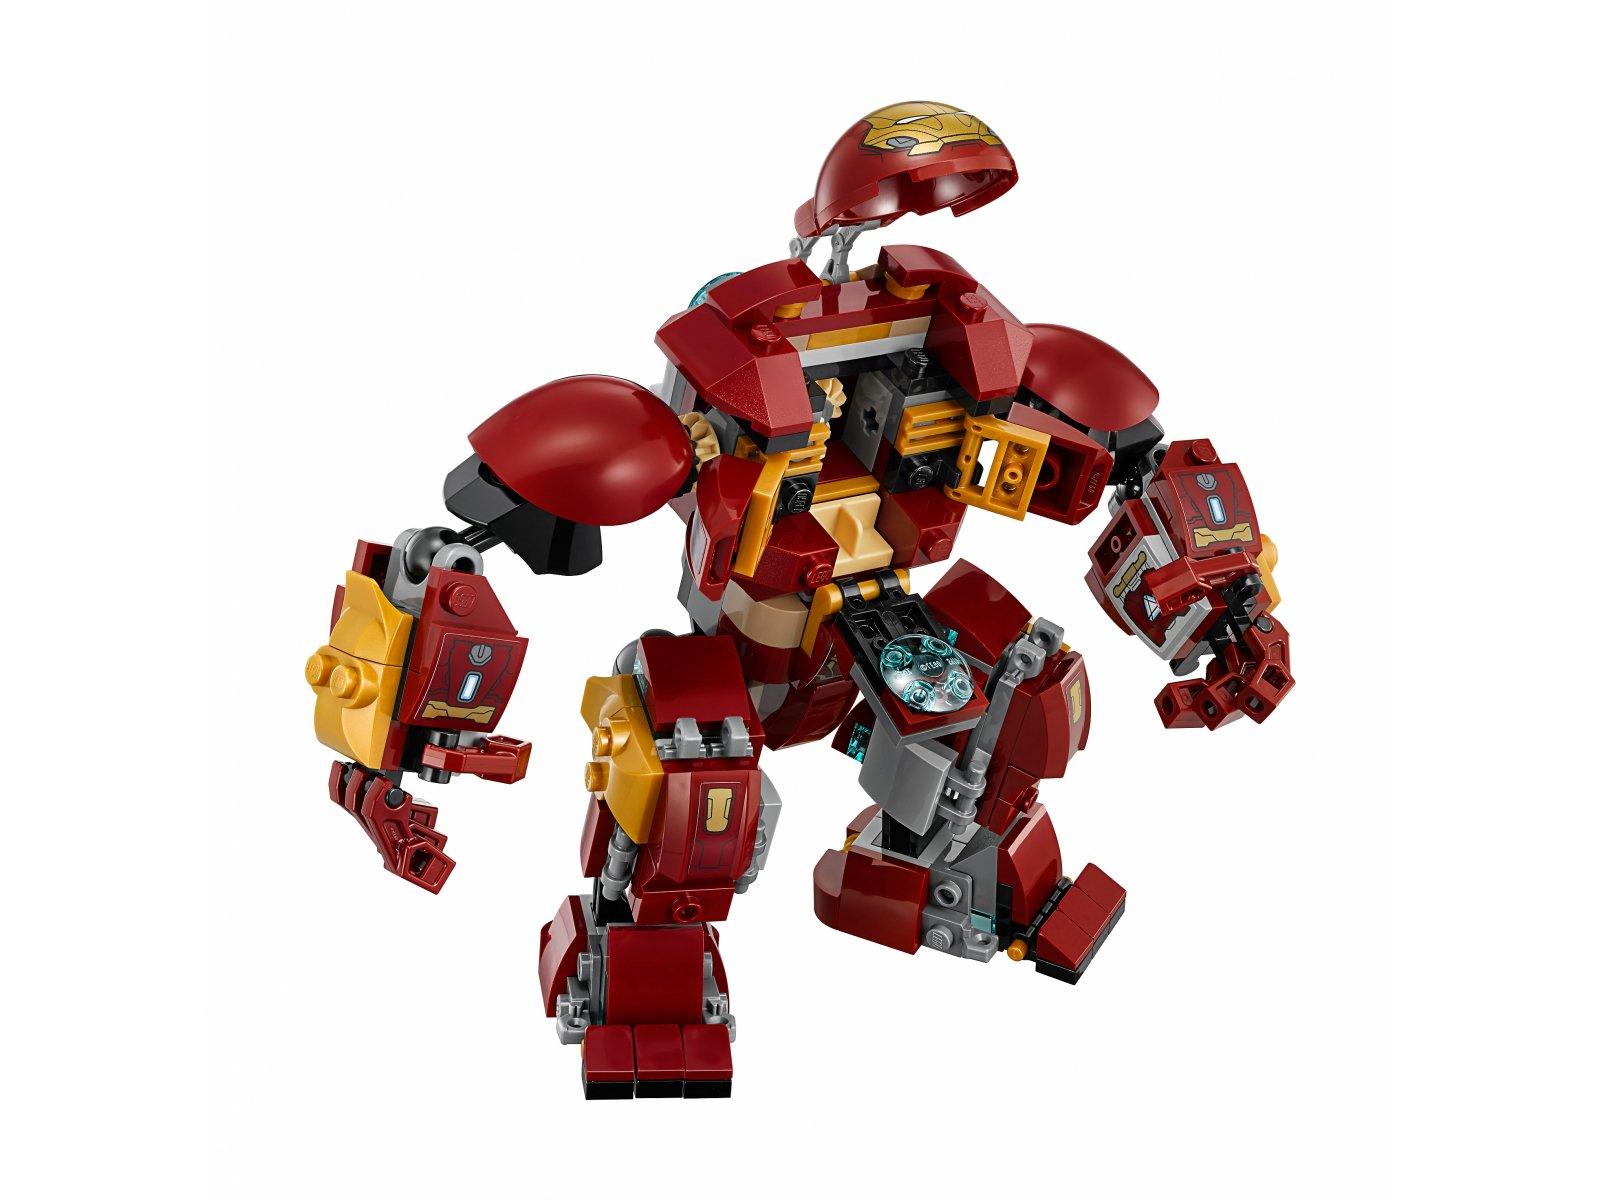 LEGO 76104 Walka w Hulkbusterze